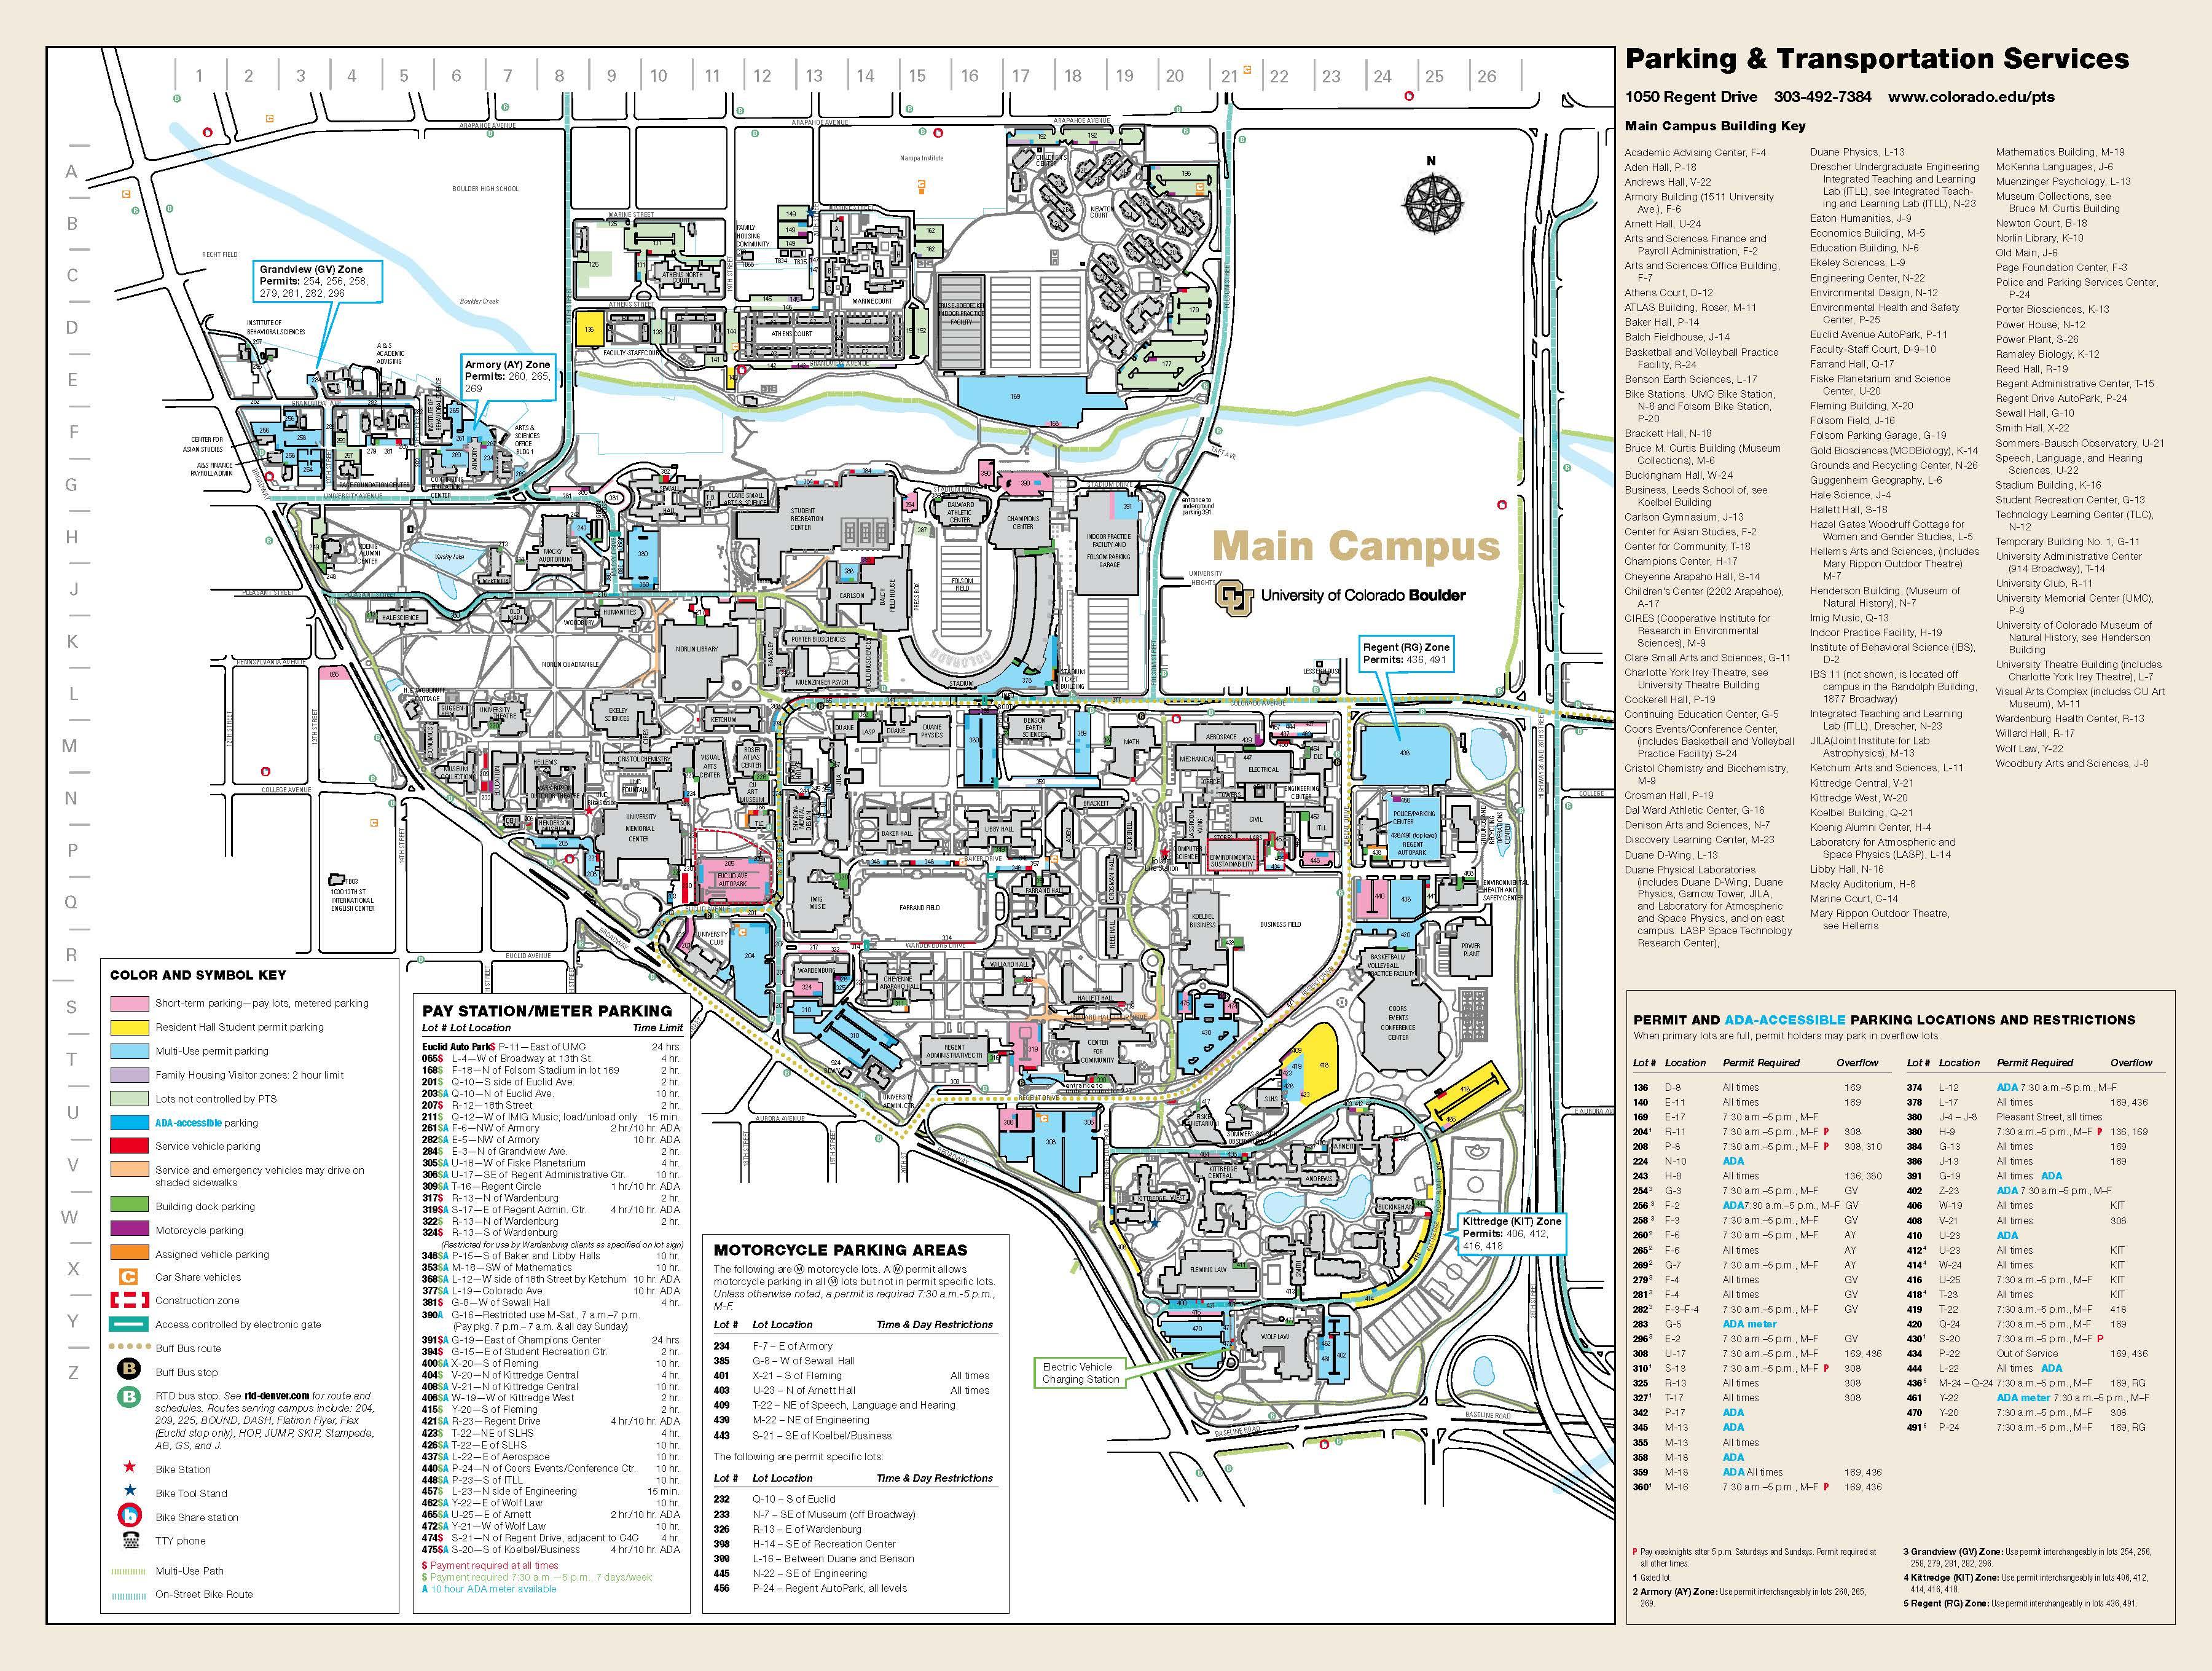 uc-boulder-parking-map